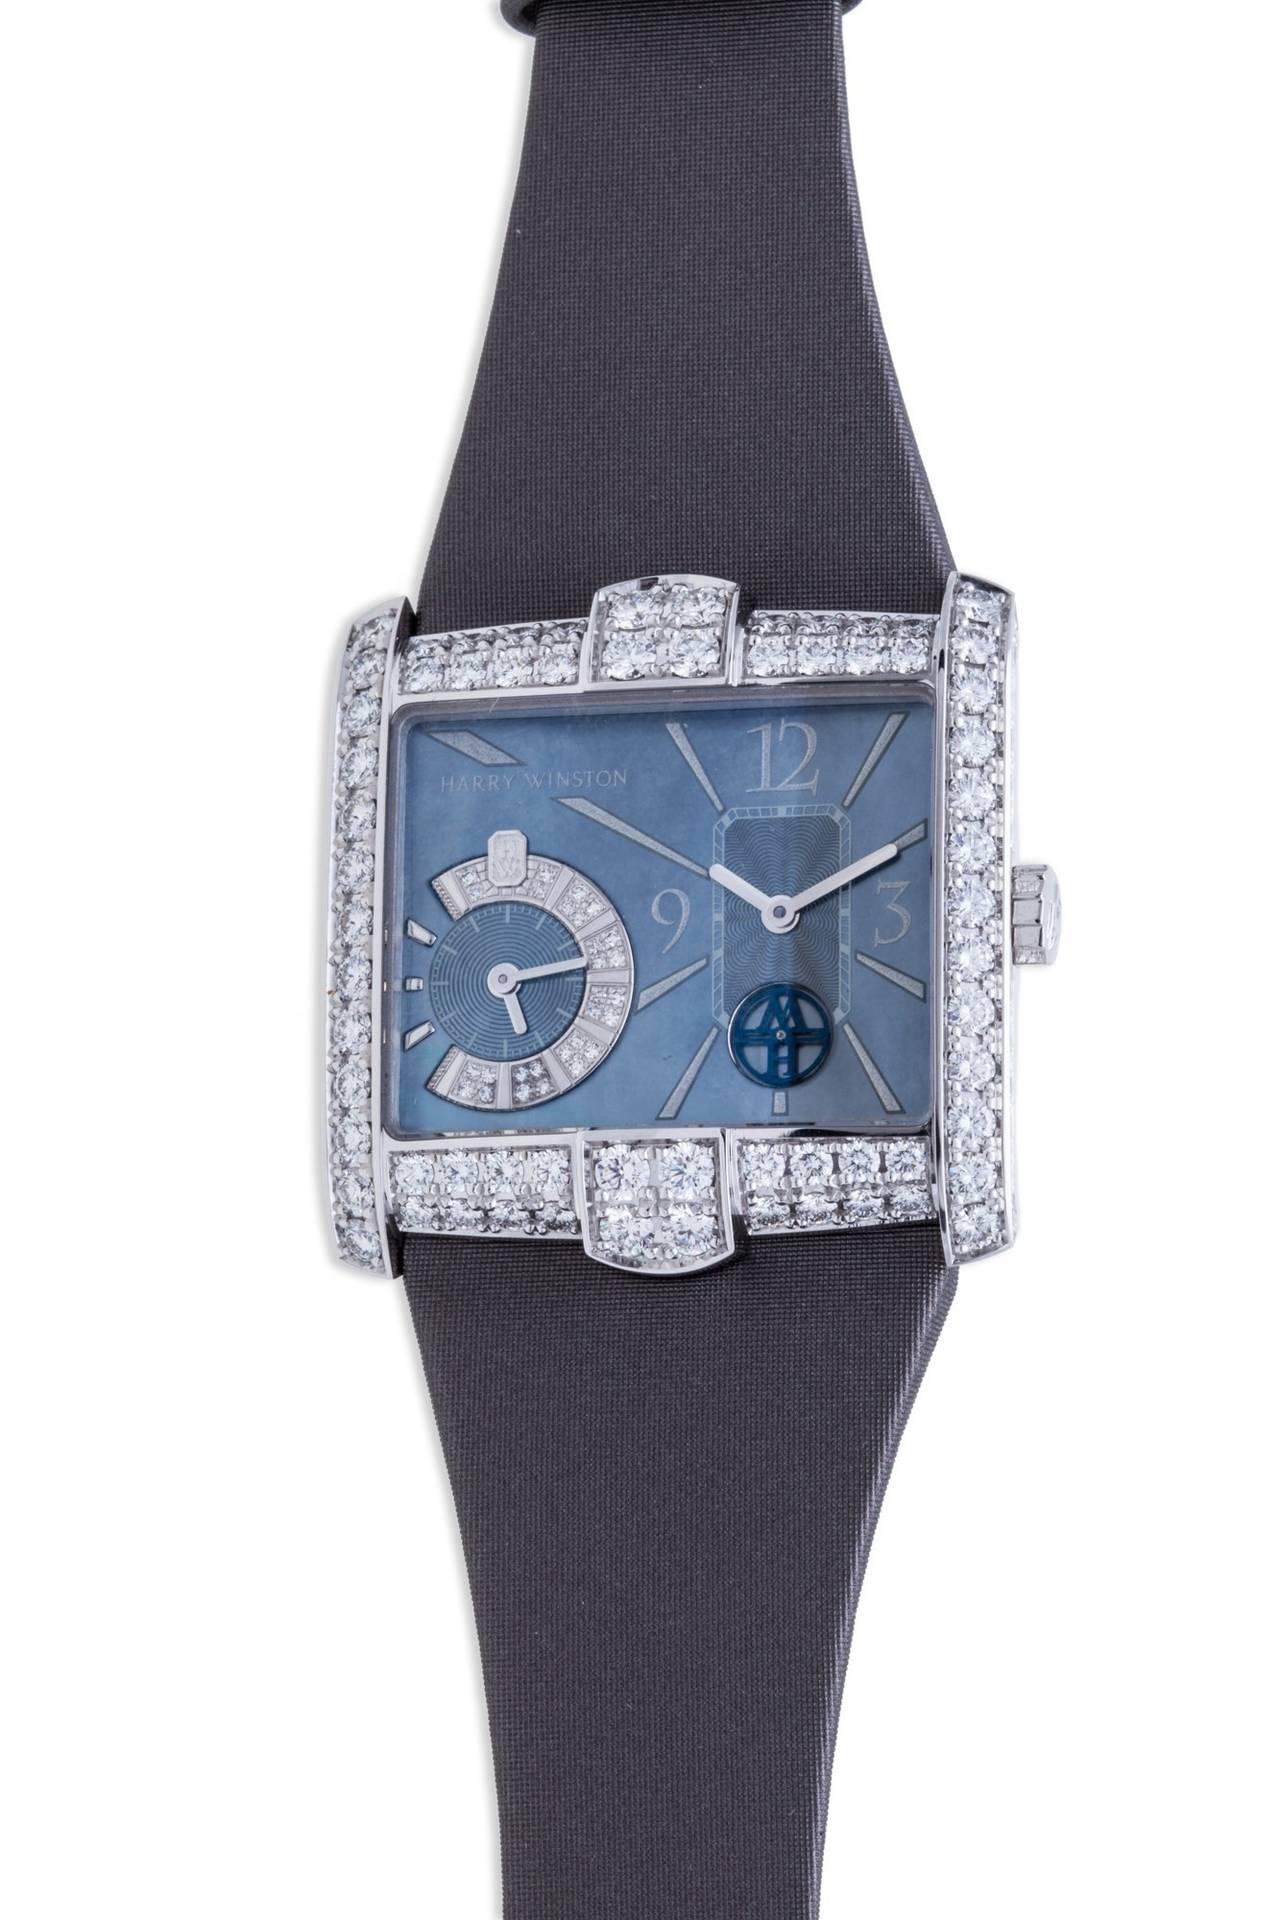 Harry Winston Ladies White Gold Diamond Avenue B Wristwatch For Sale 1